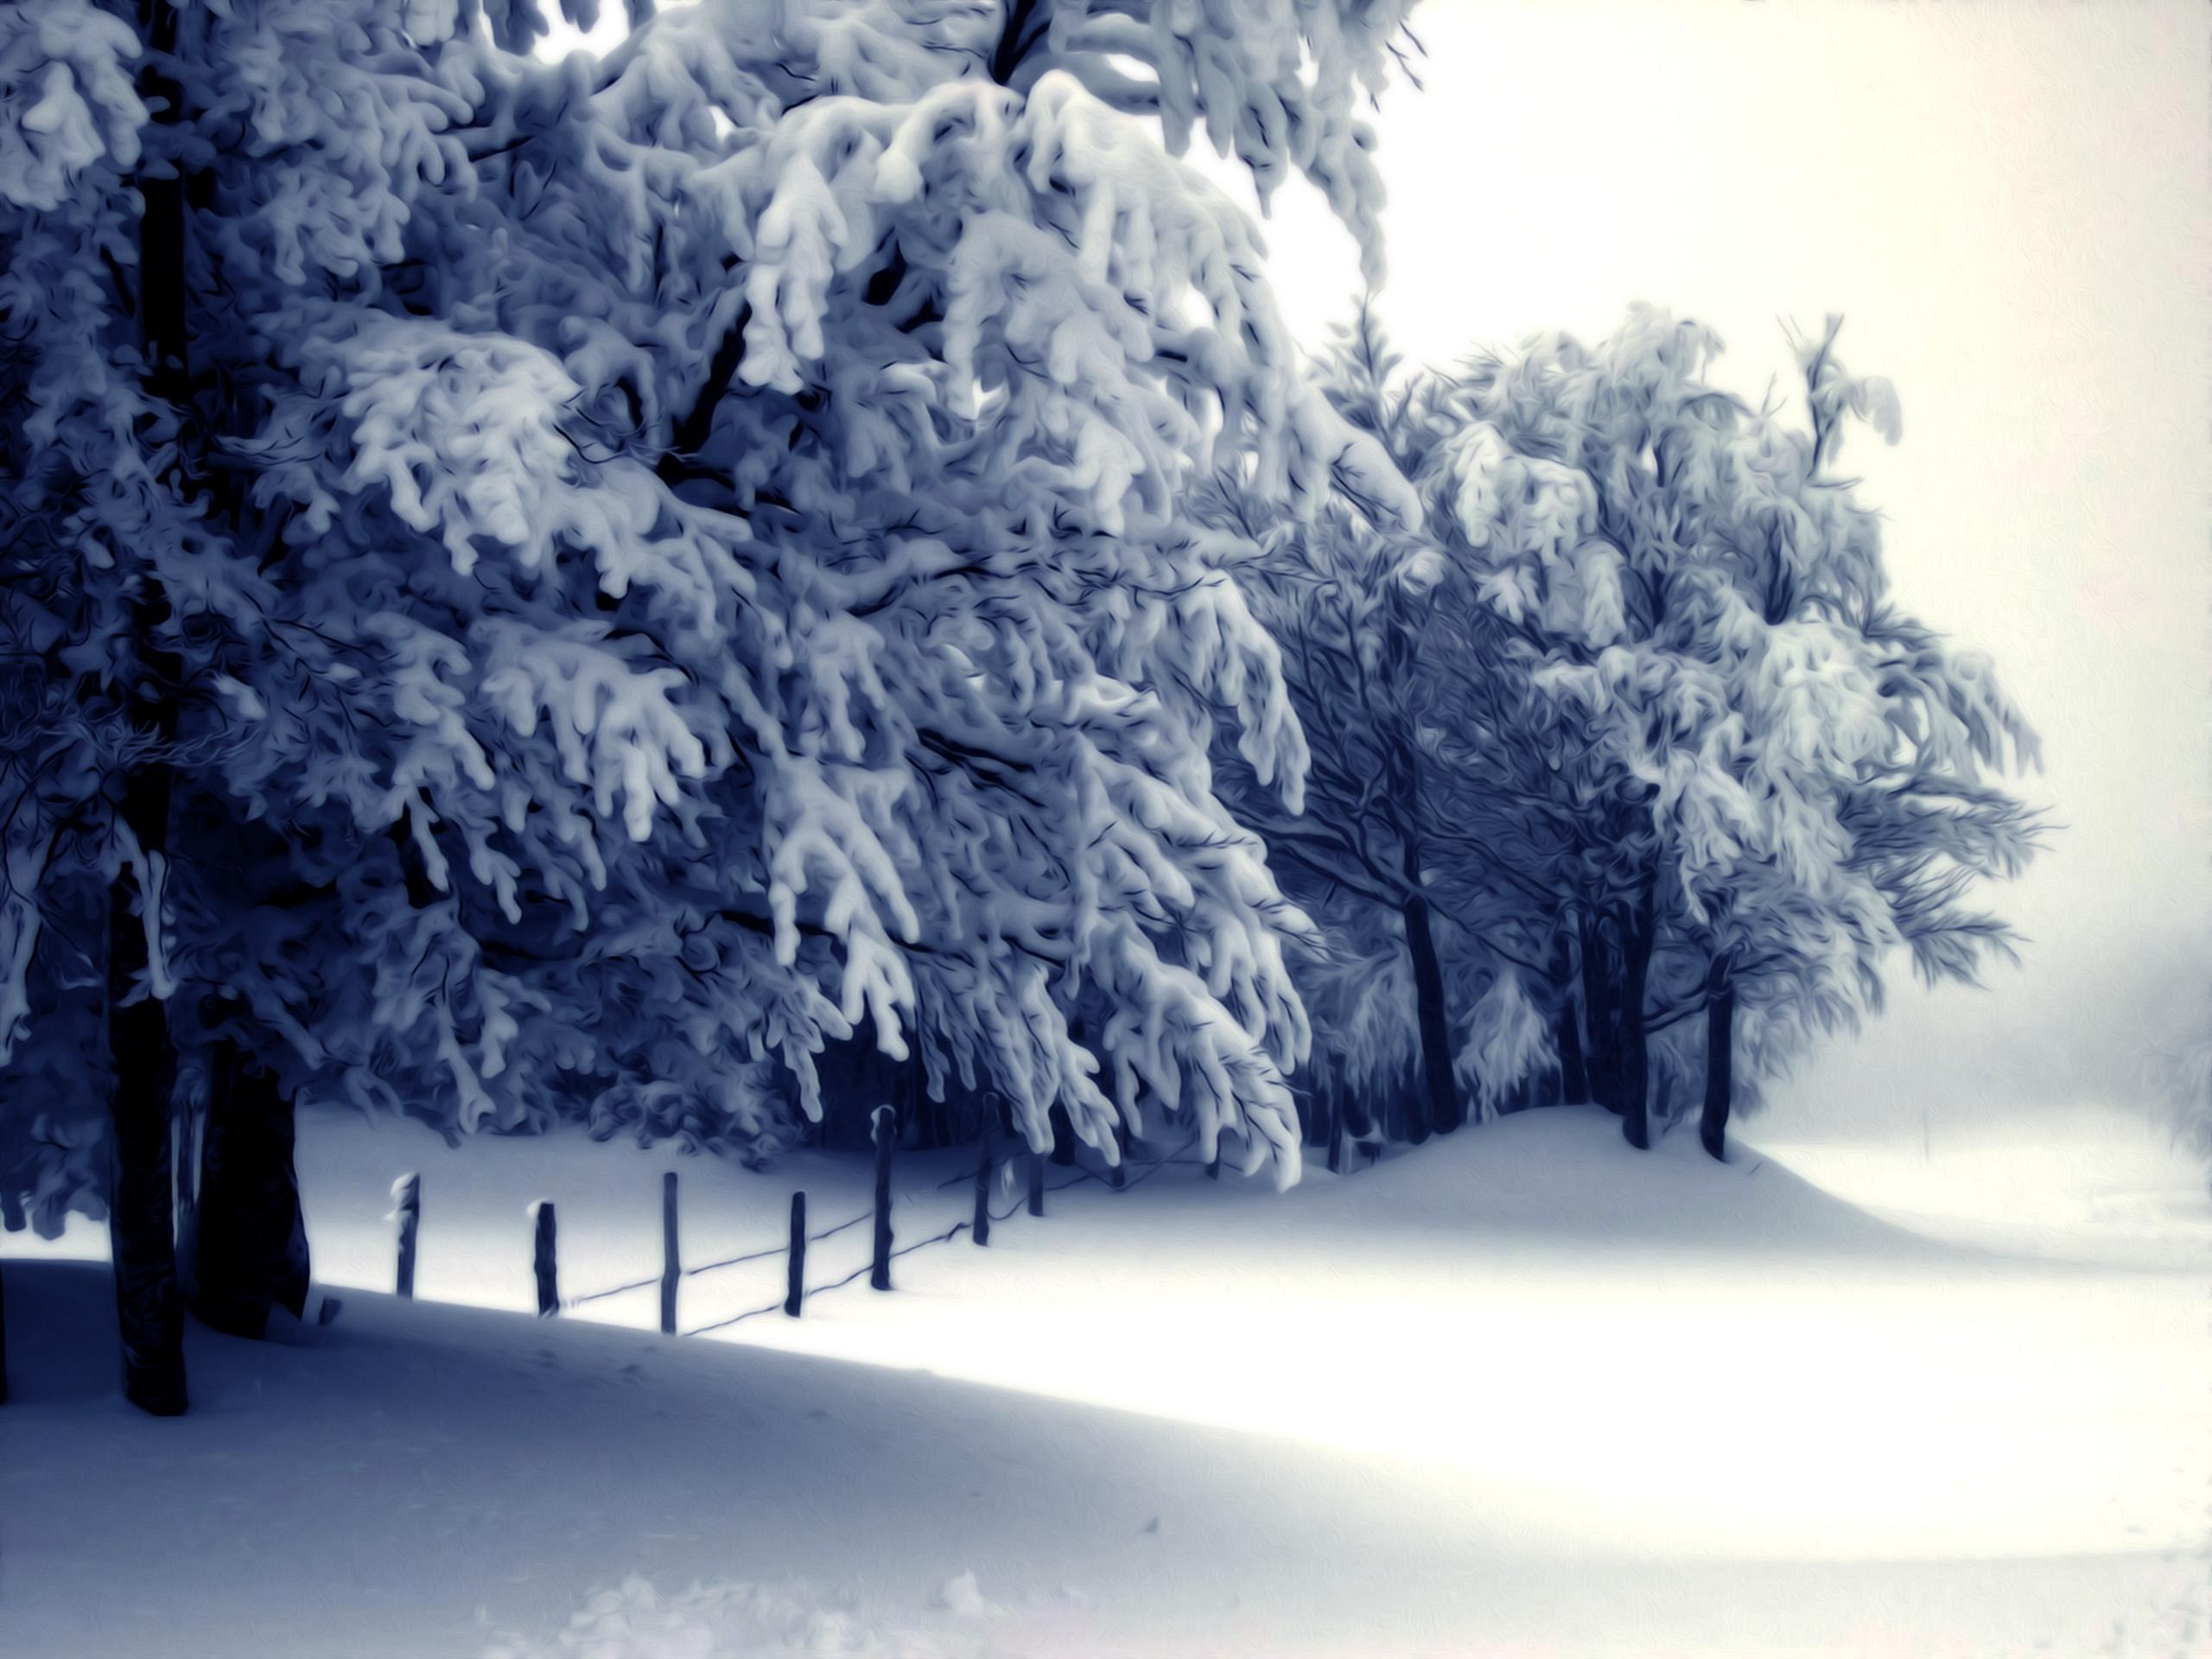 Snow Scenery Wallpaper 2560x1920